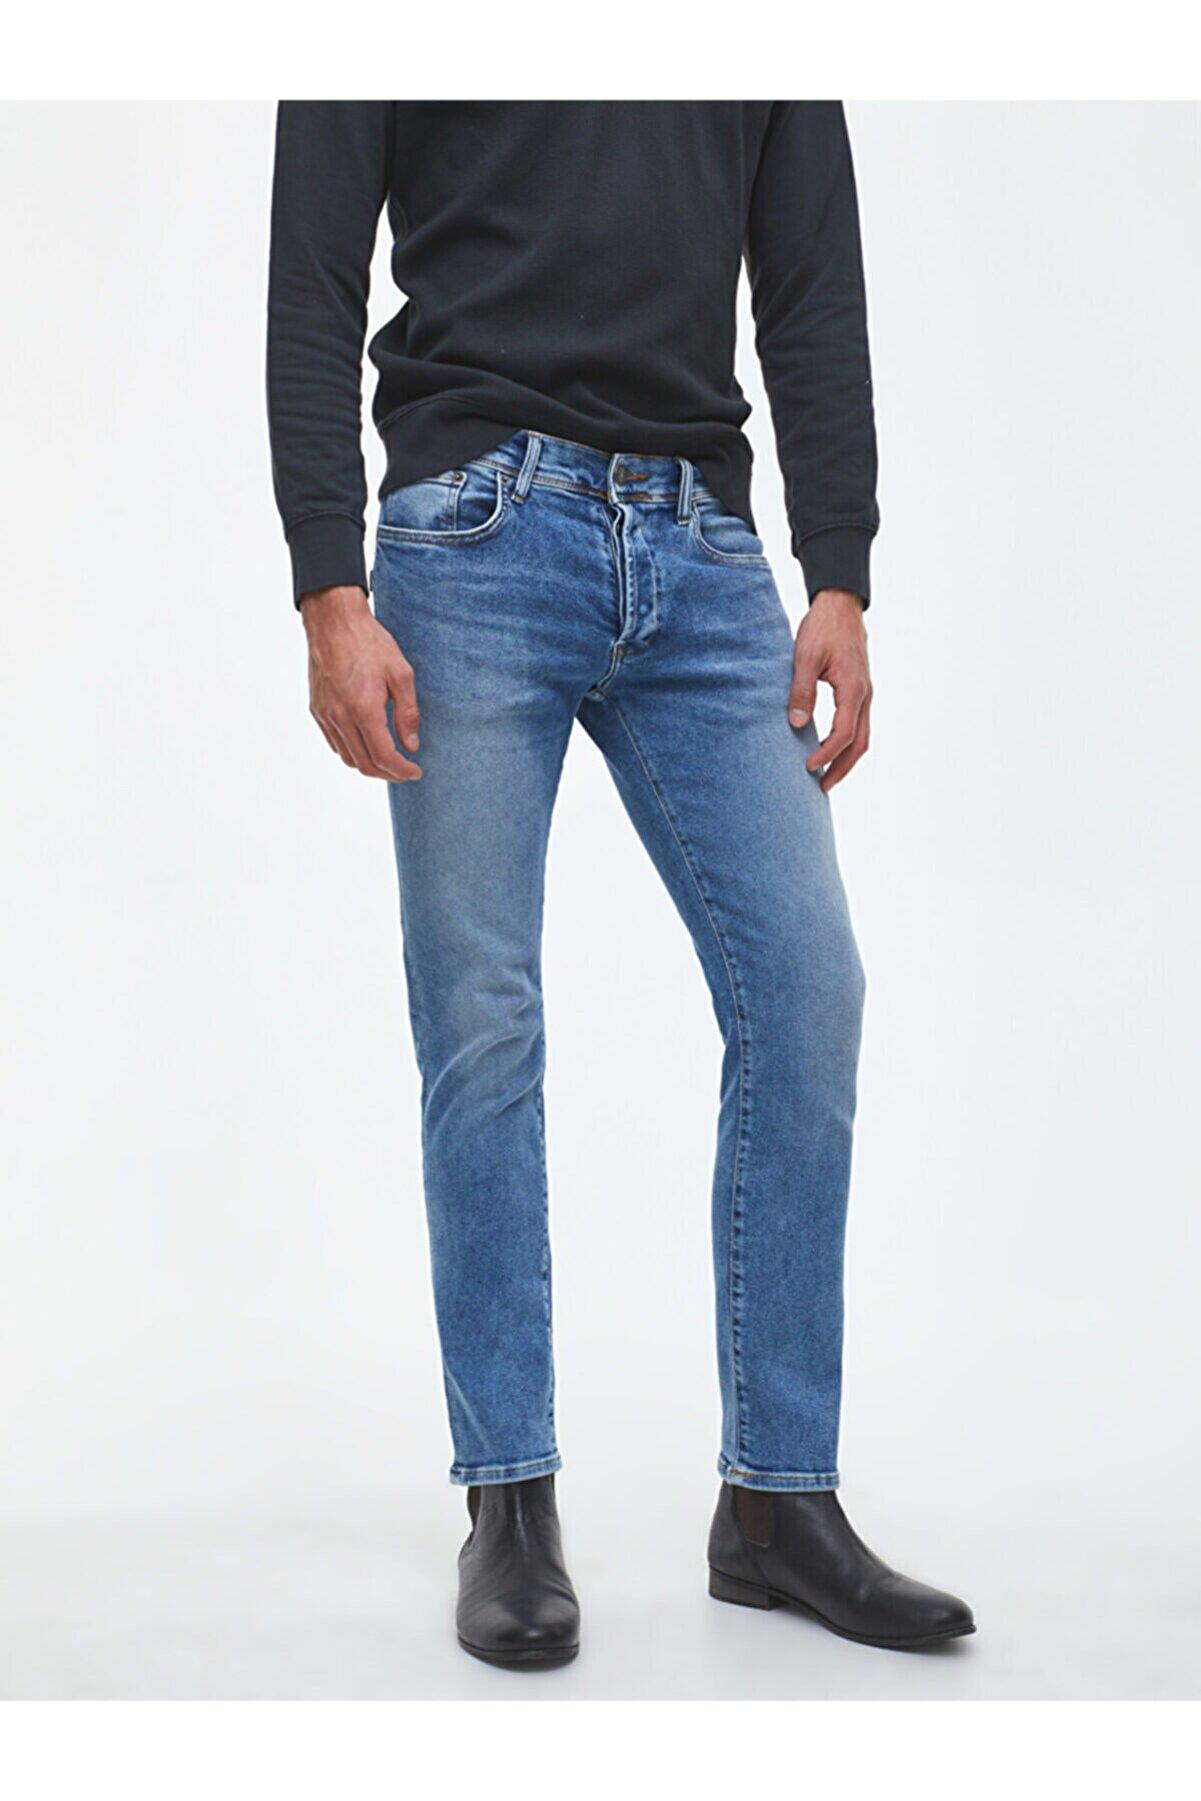 Ltb Jerard Everglow Wash Pantolon